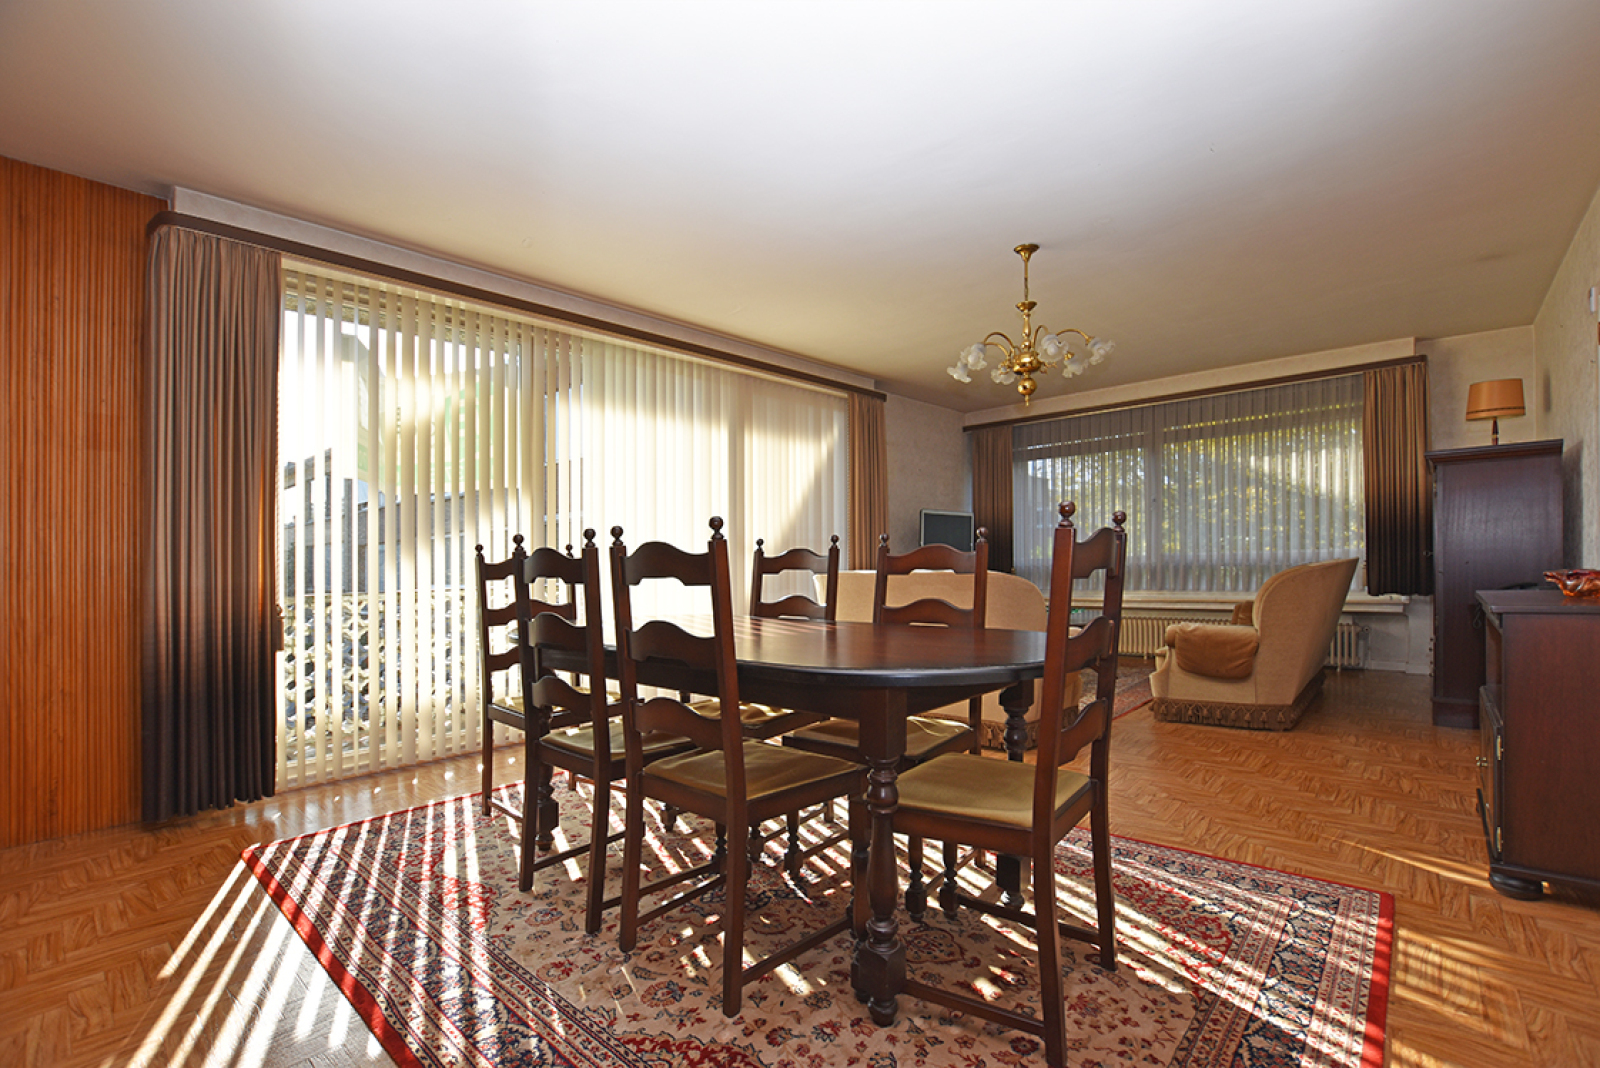 Te renoveren appartement met twee slaapkamers in een rustige straat te Deurne!  afbeelding 1